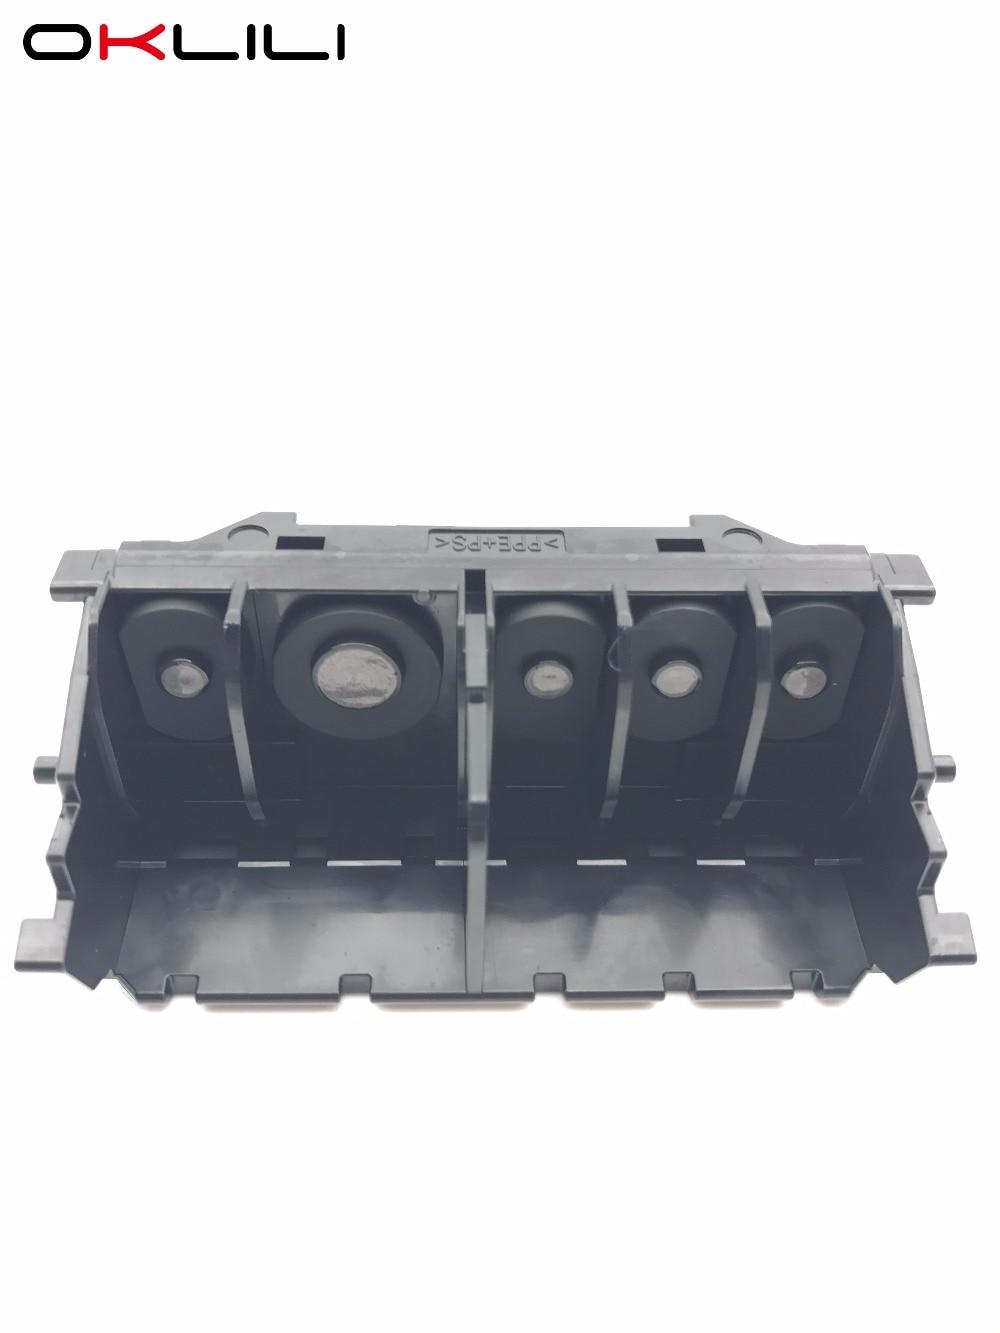 QY6 0082 Printhead Print Head for Canon iP7200 iP7210 iP7220 iP7240 iP7250 MG5410 MG5420 MG5440 MG5450